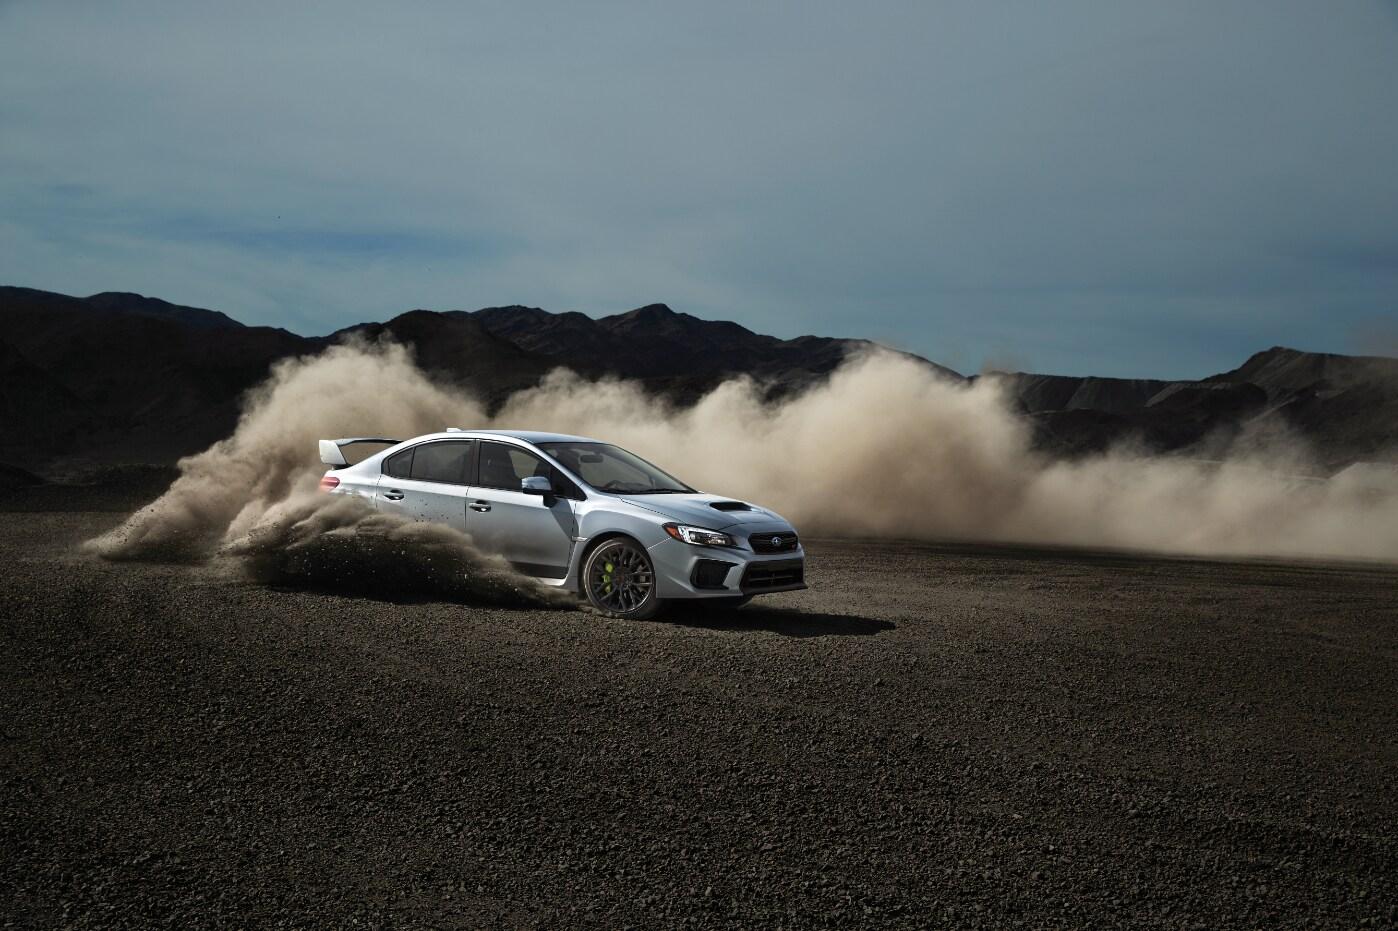 New Subaru Wrx Lancaster Ca Subaru Antelope Valley